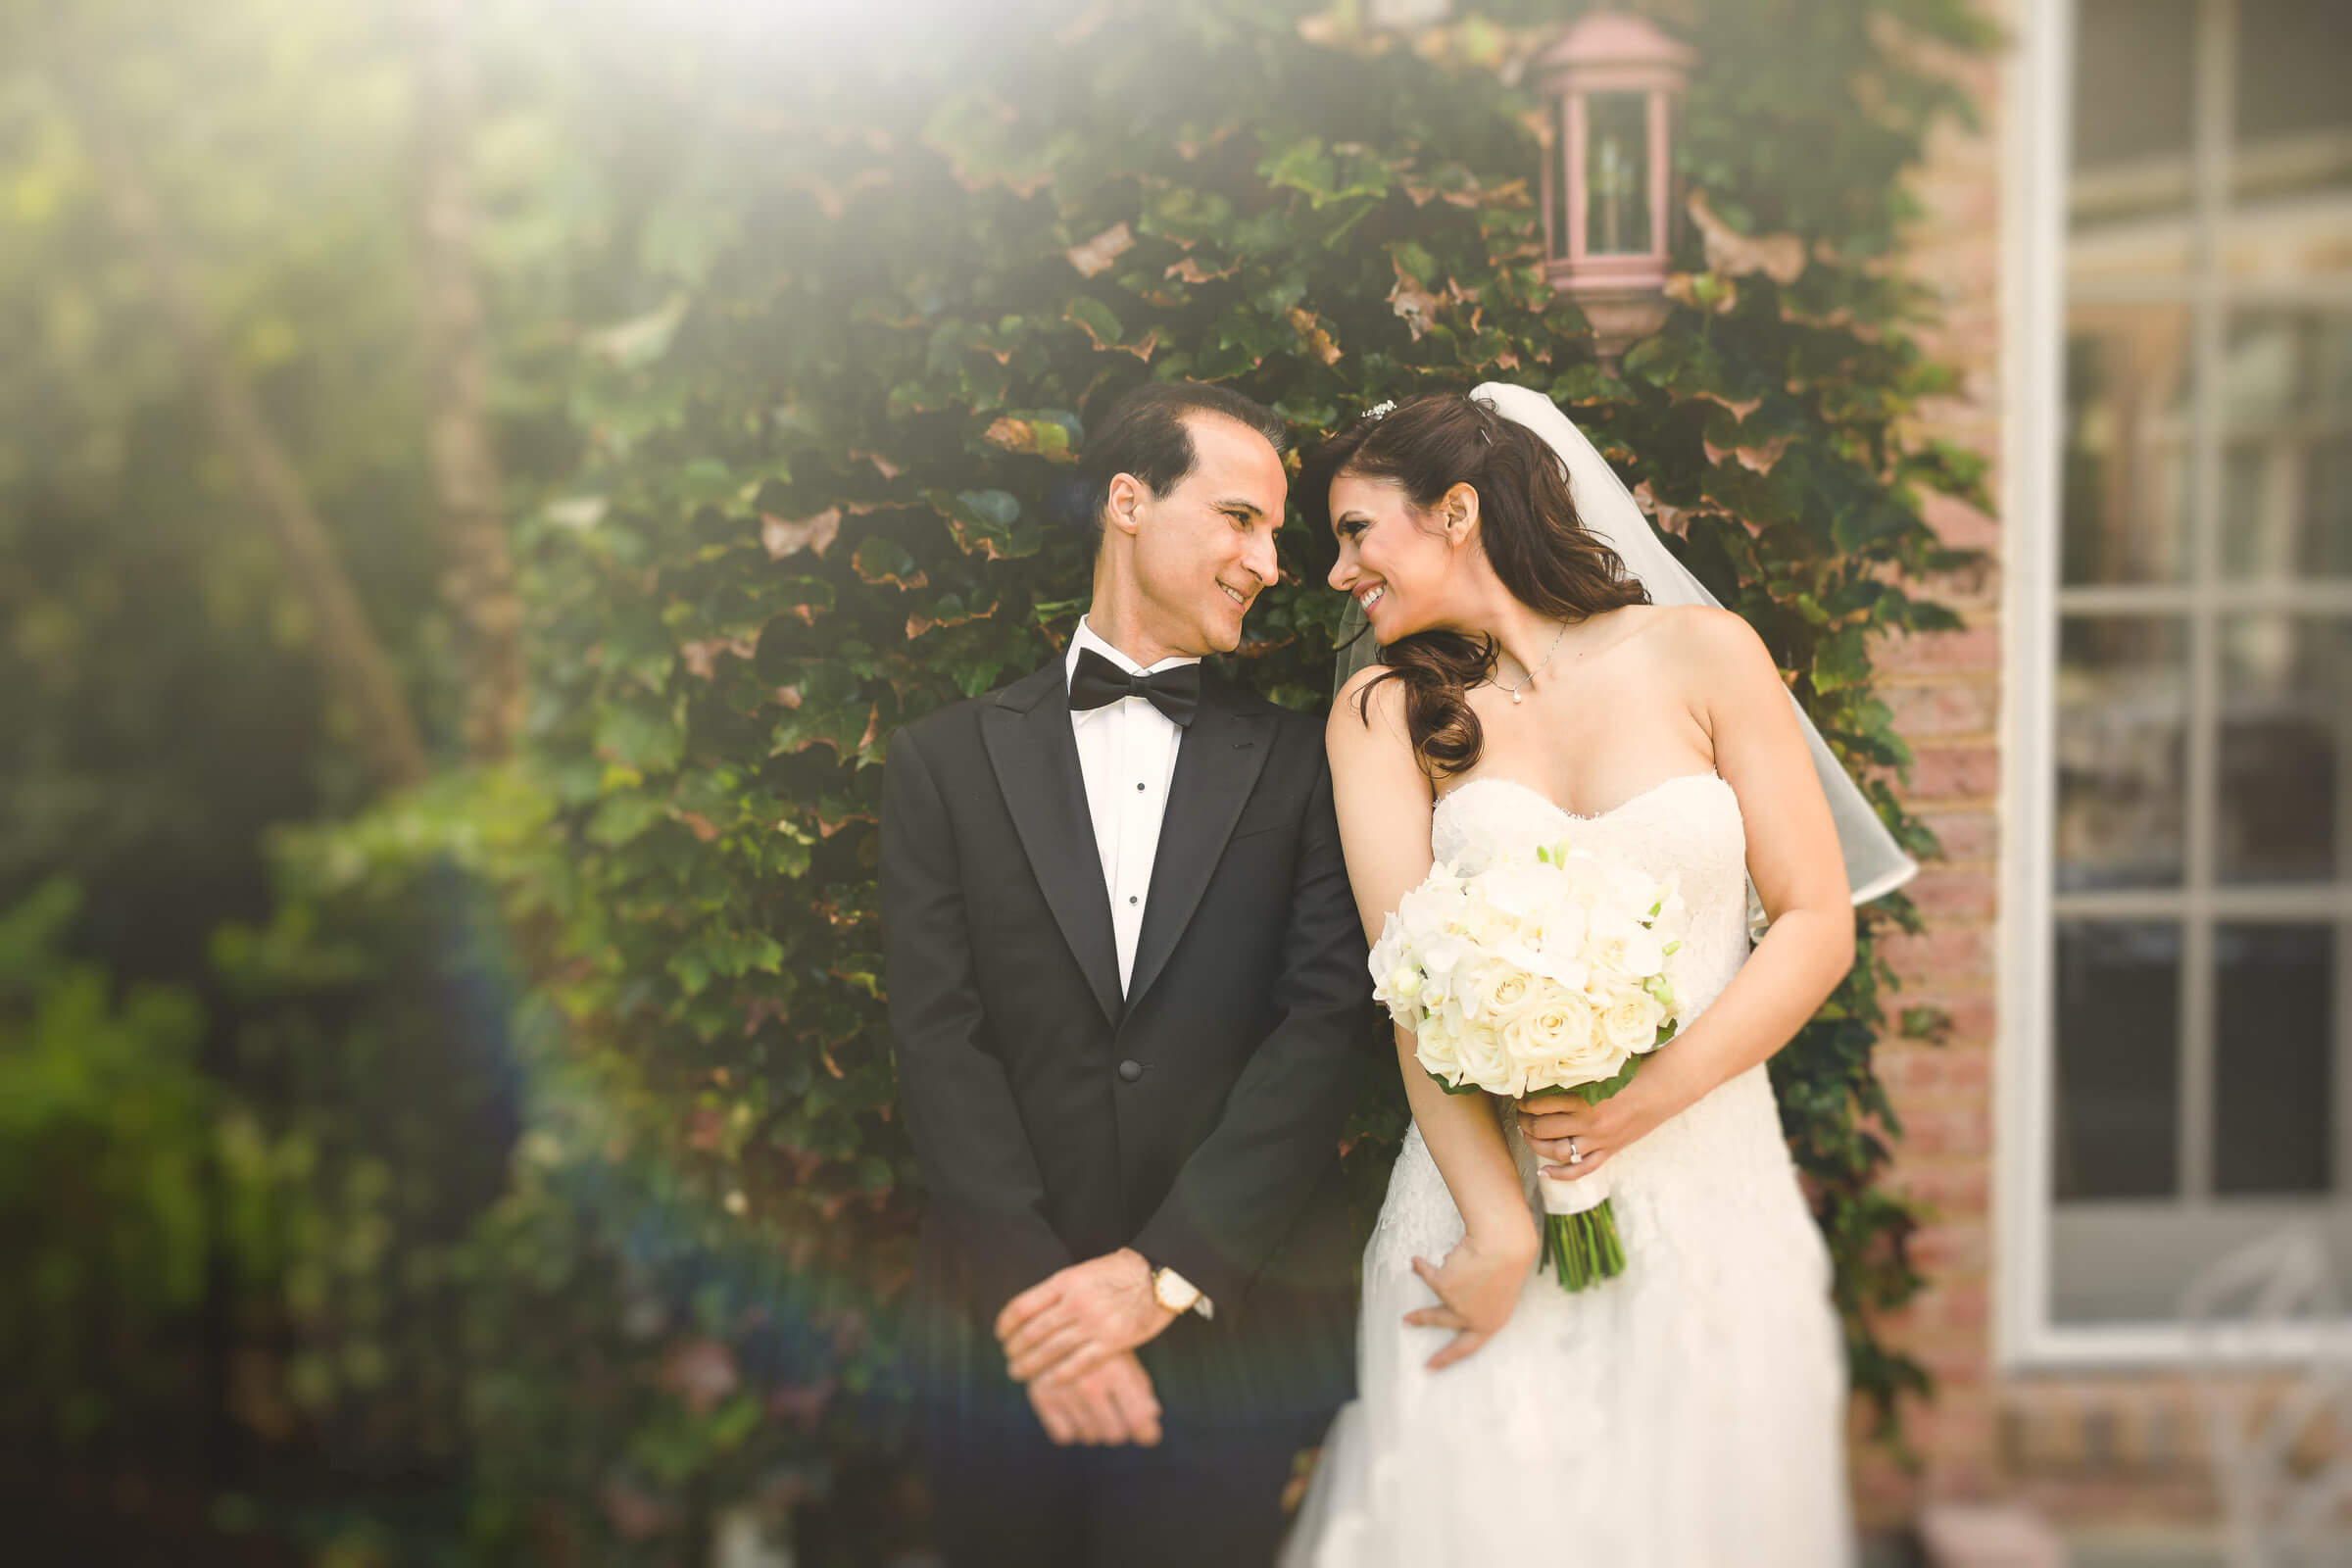 Parnaz & Mohsen's Wedding